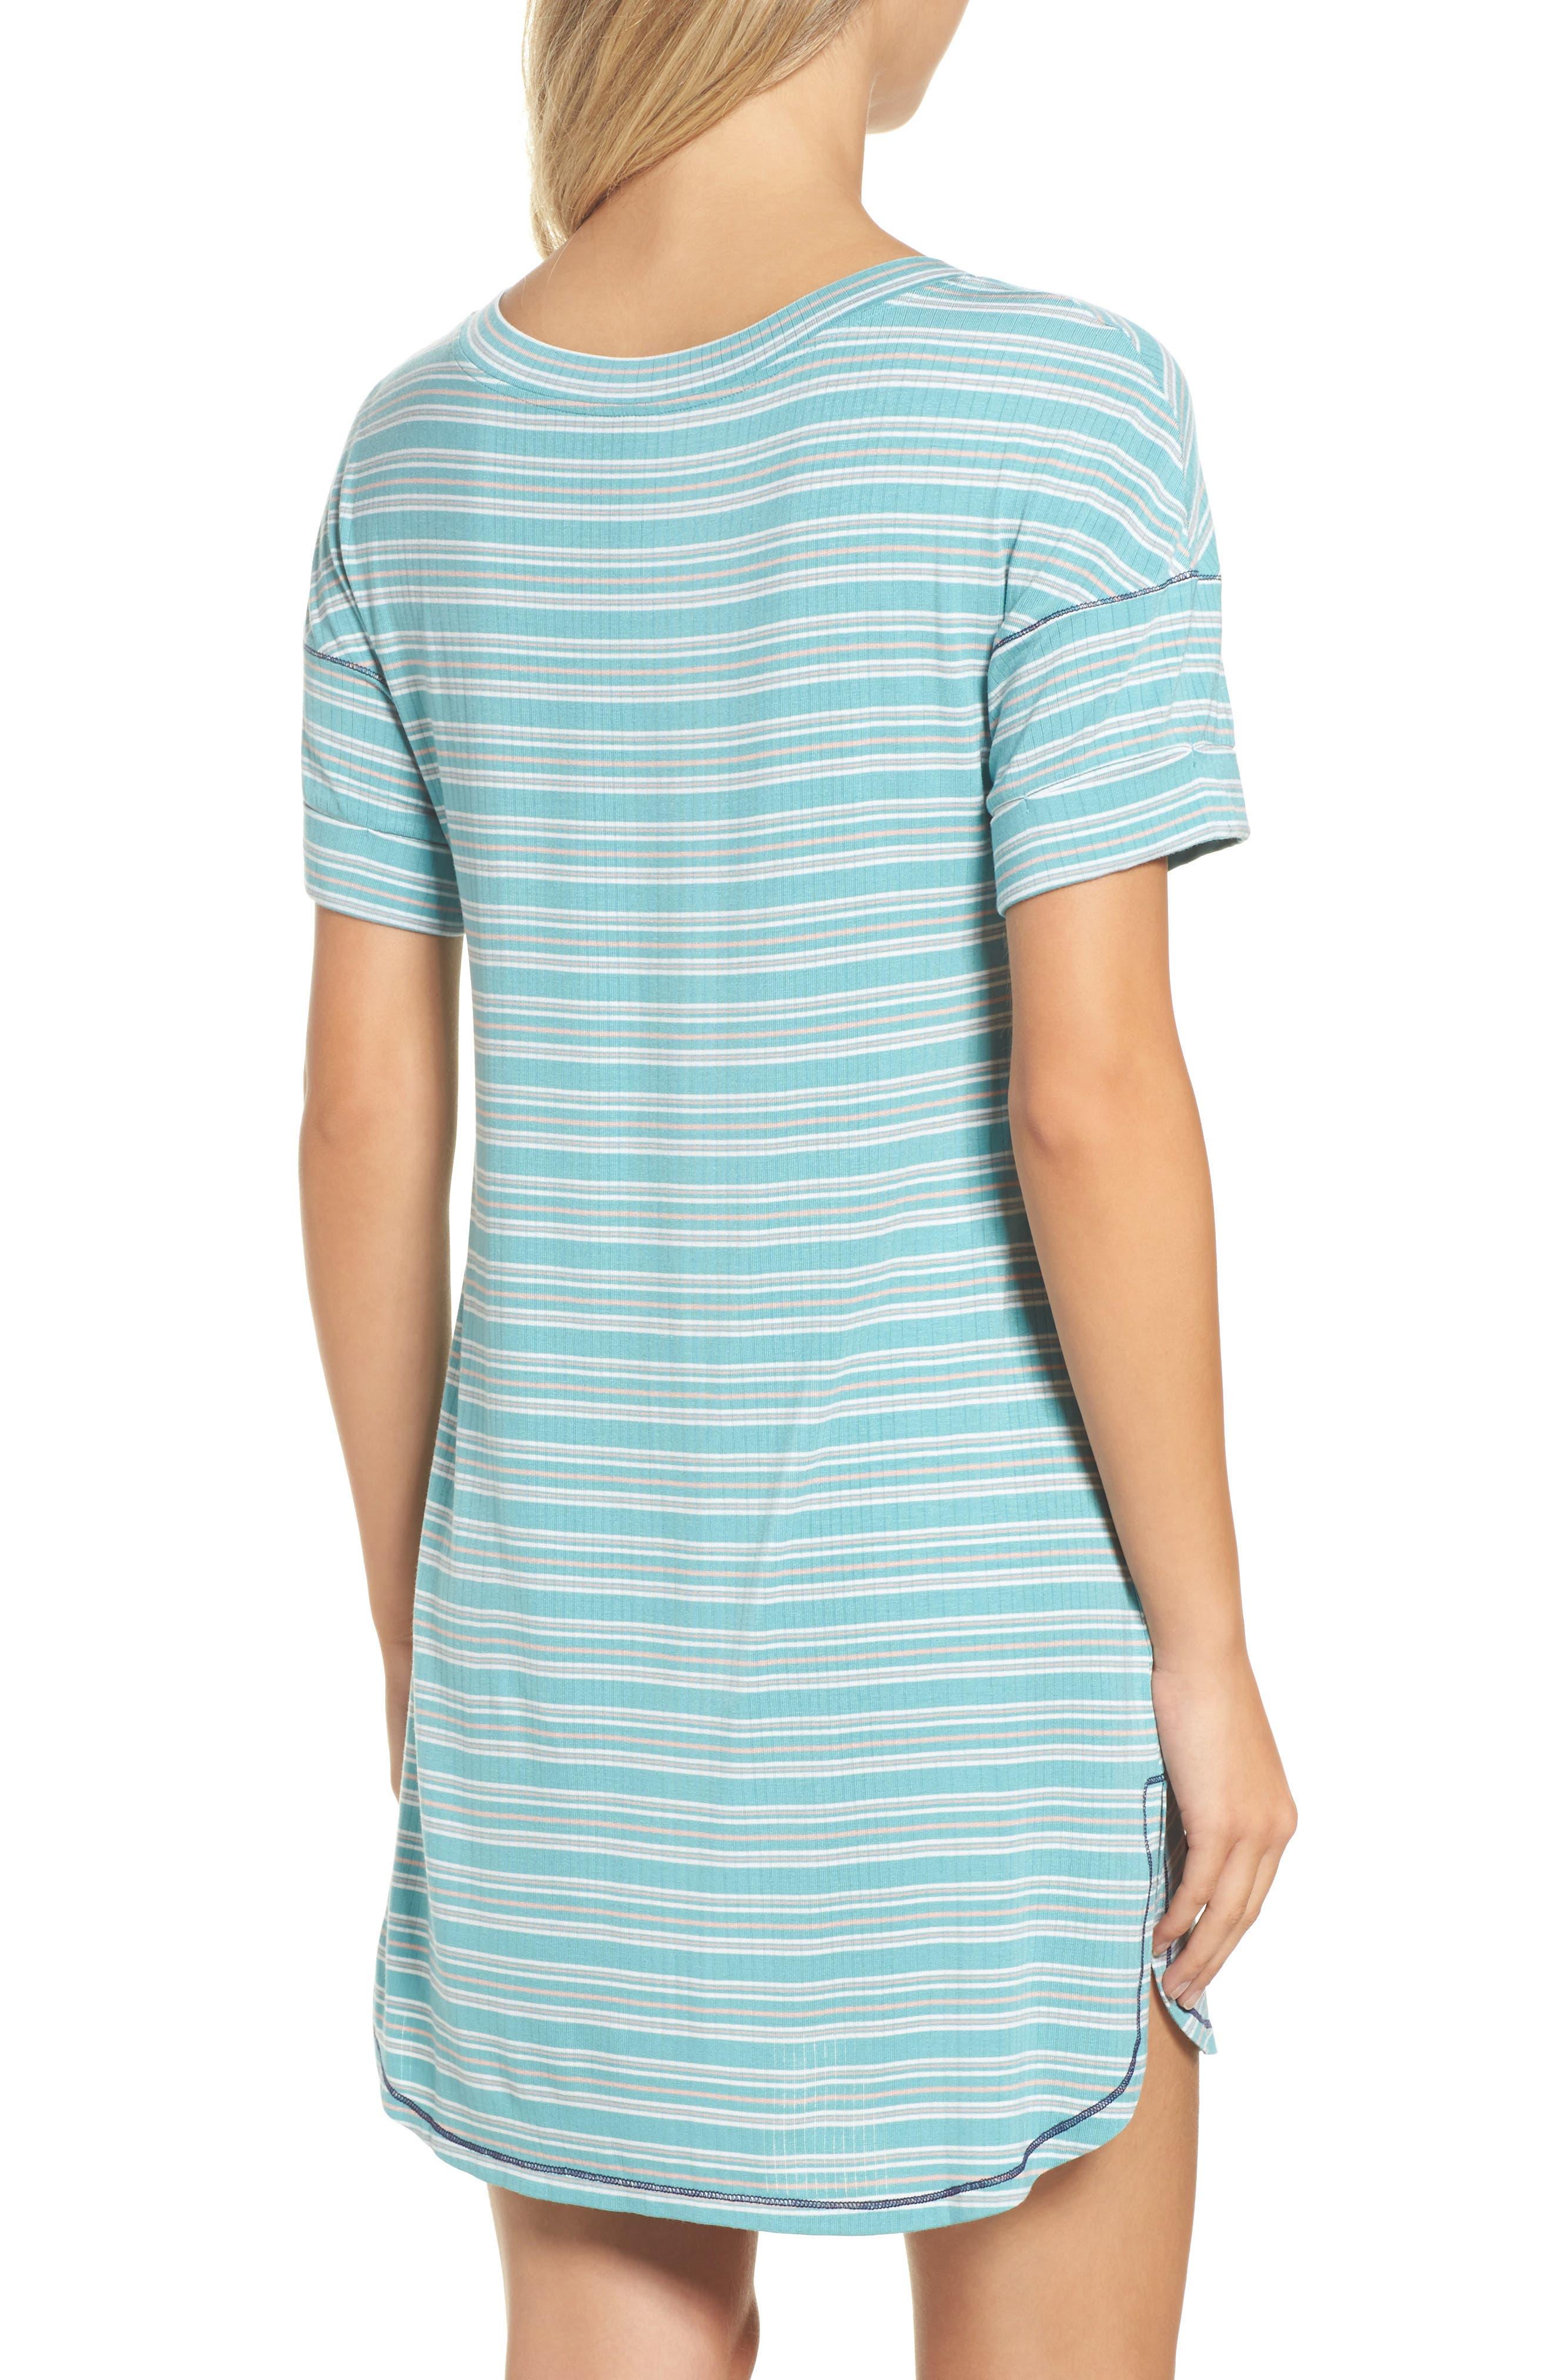 Rib Sleep Shirt,                             Alternate thumbnail 2, color,                             300